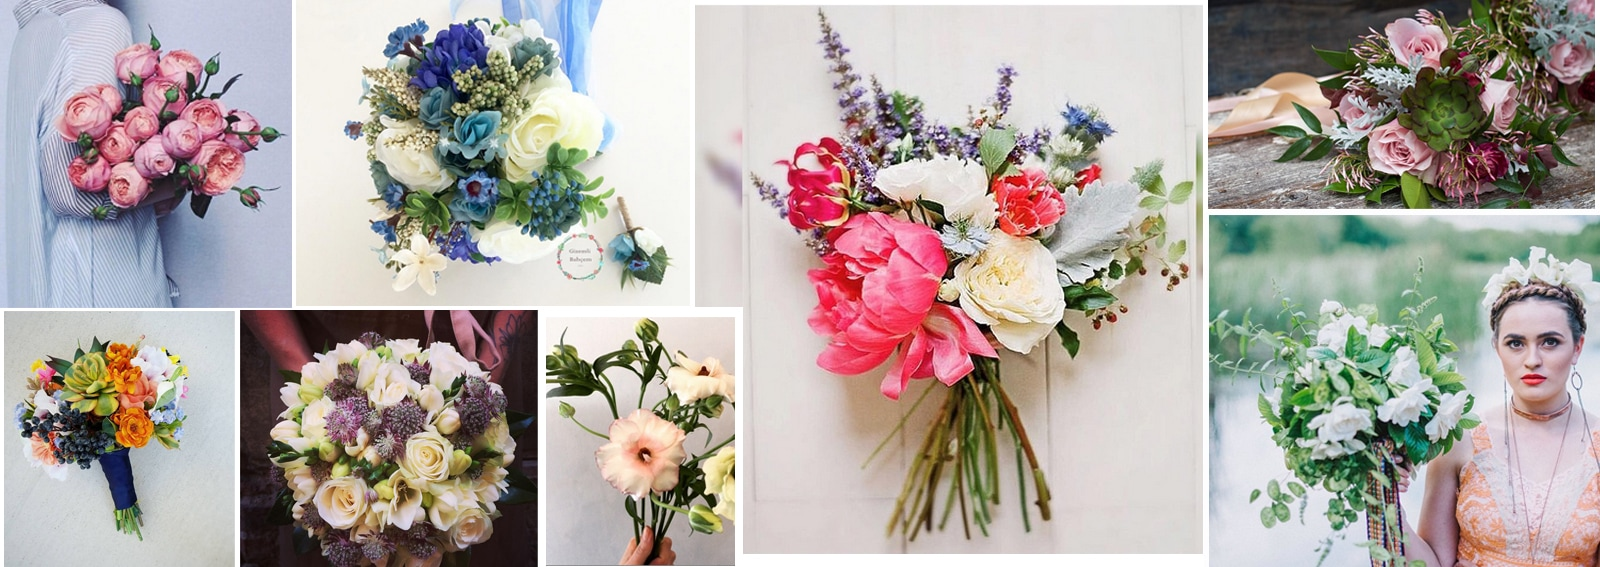 COVER-fiori-bouquet-da-instagram-DESKTOP